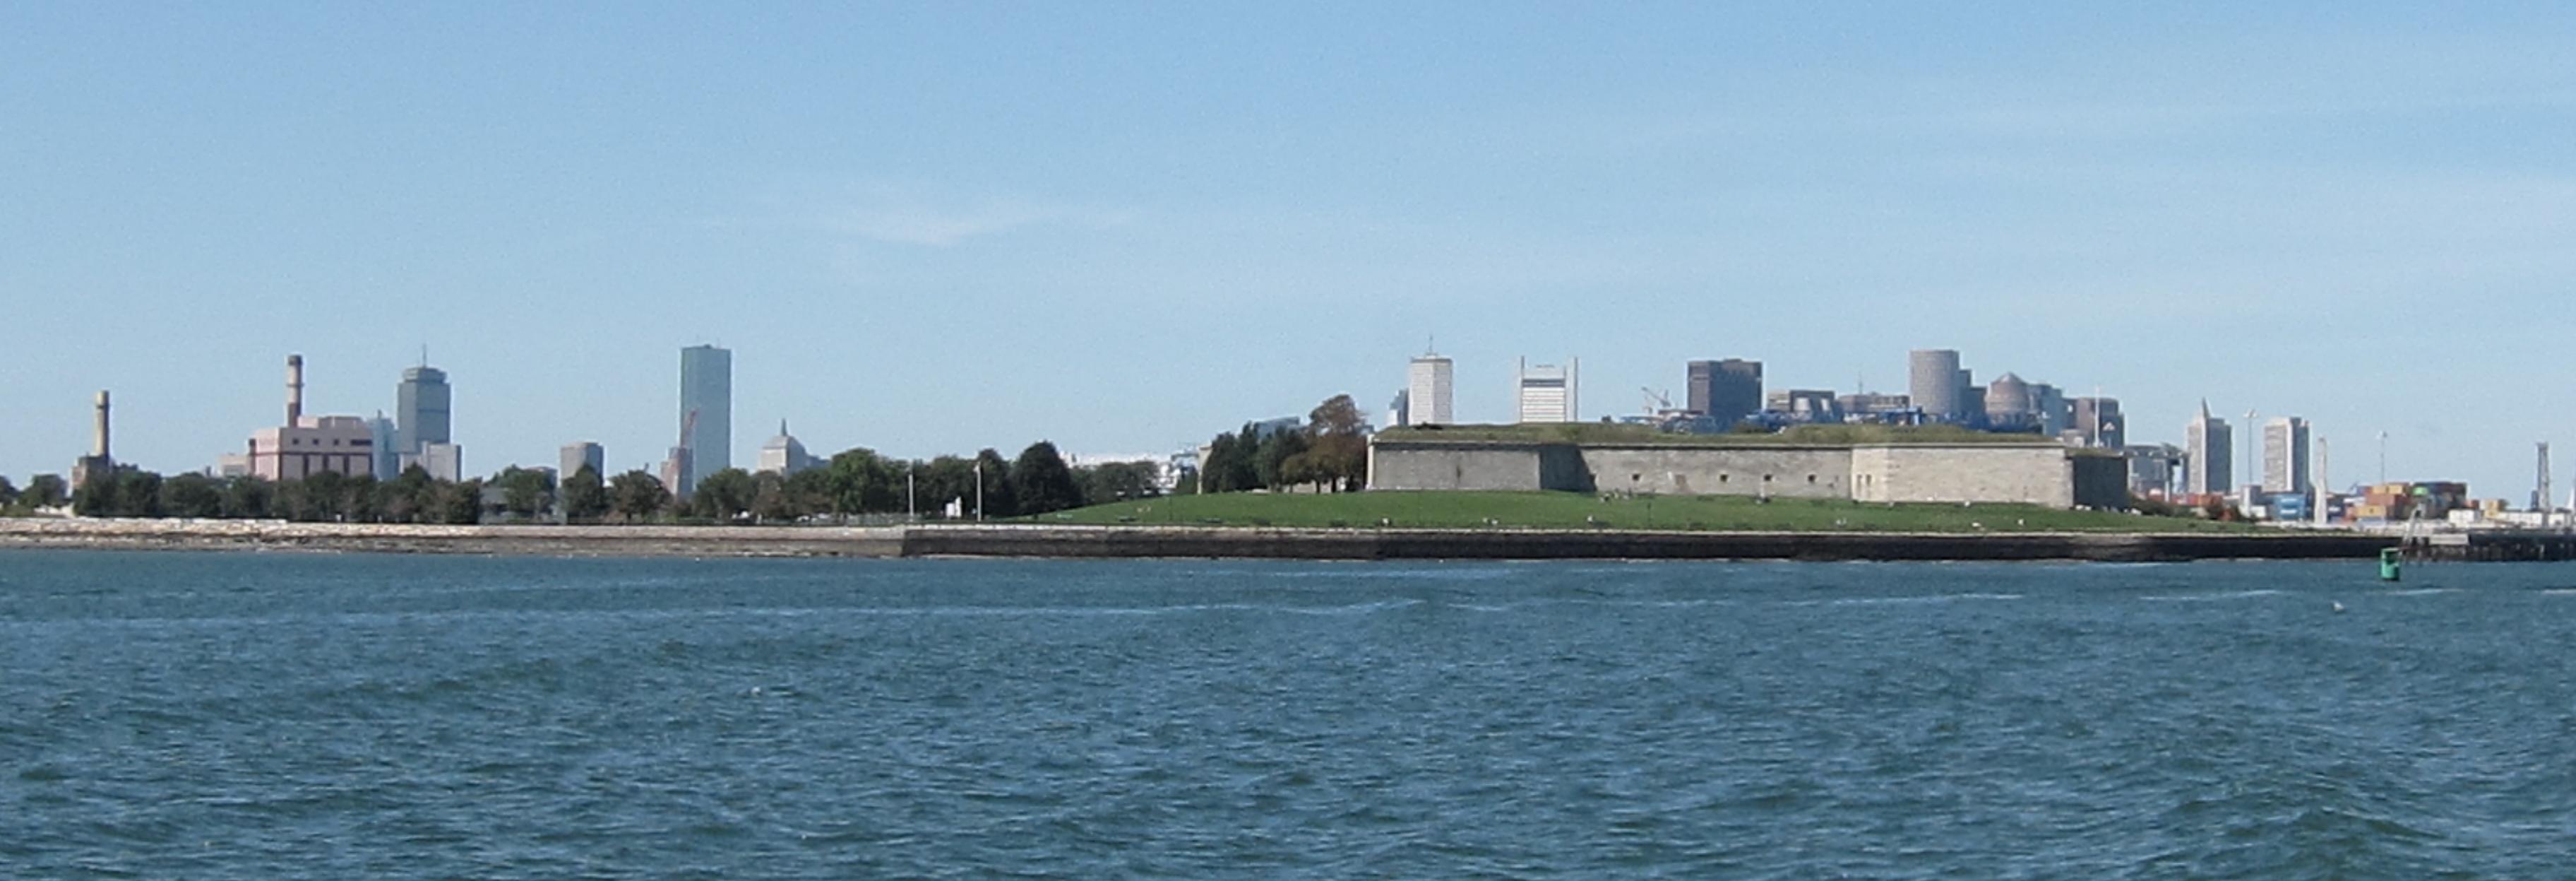 Boston Harbor Island Boat Tours